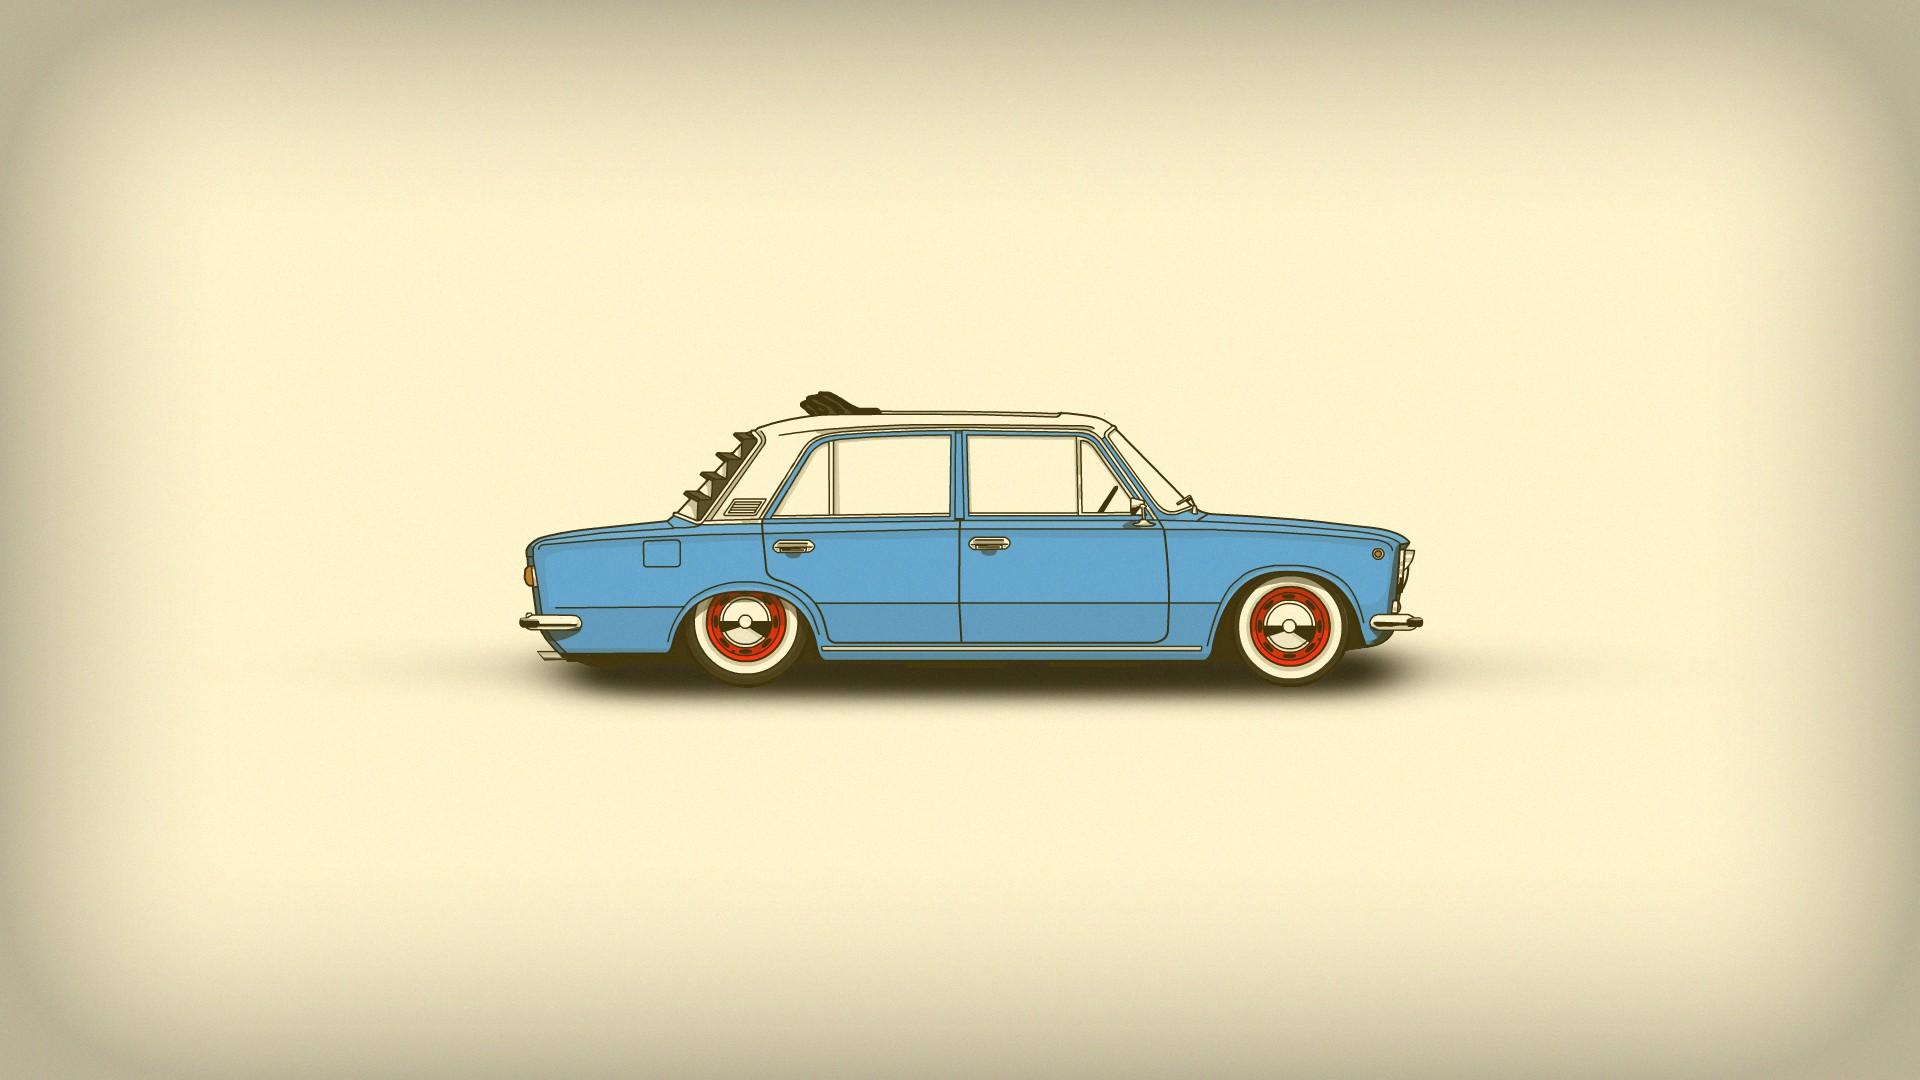 Animal Wallpaper Full Hd Car Blue Cars Minimalism Wallpapers Hd Desktop And